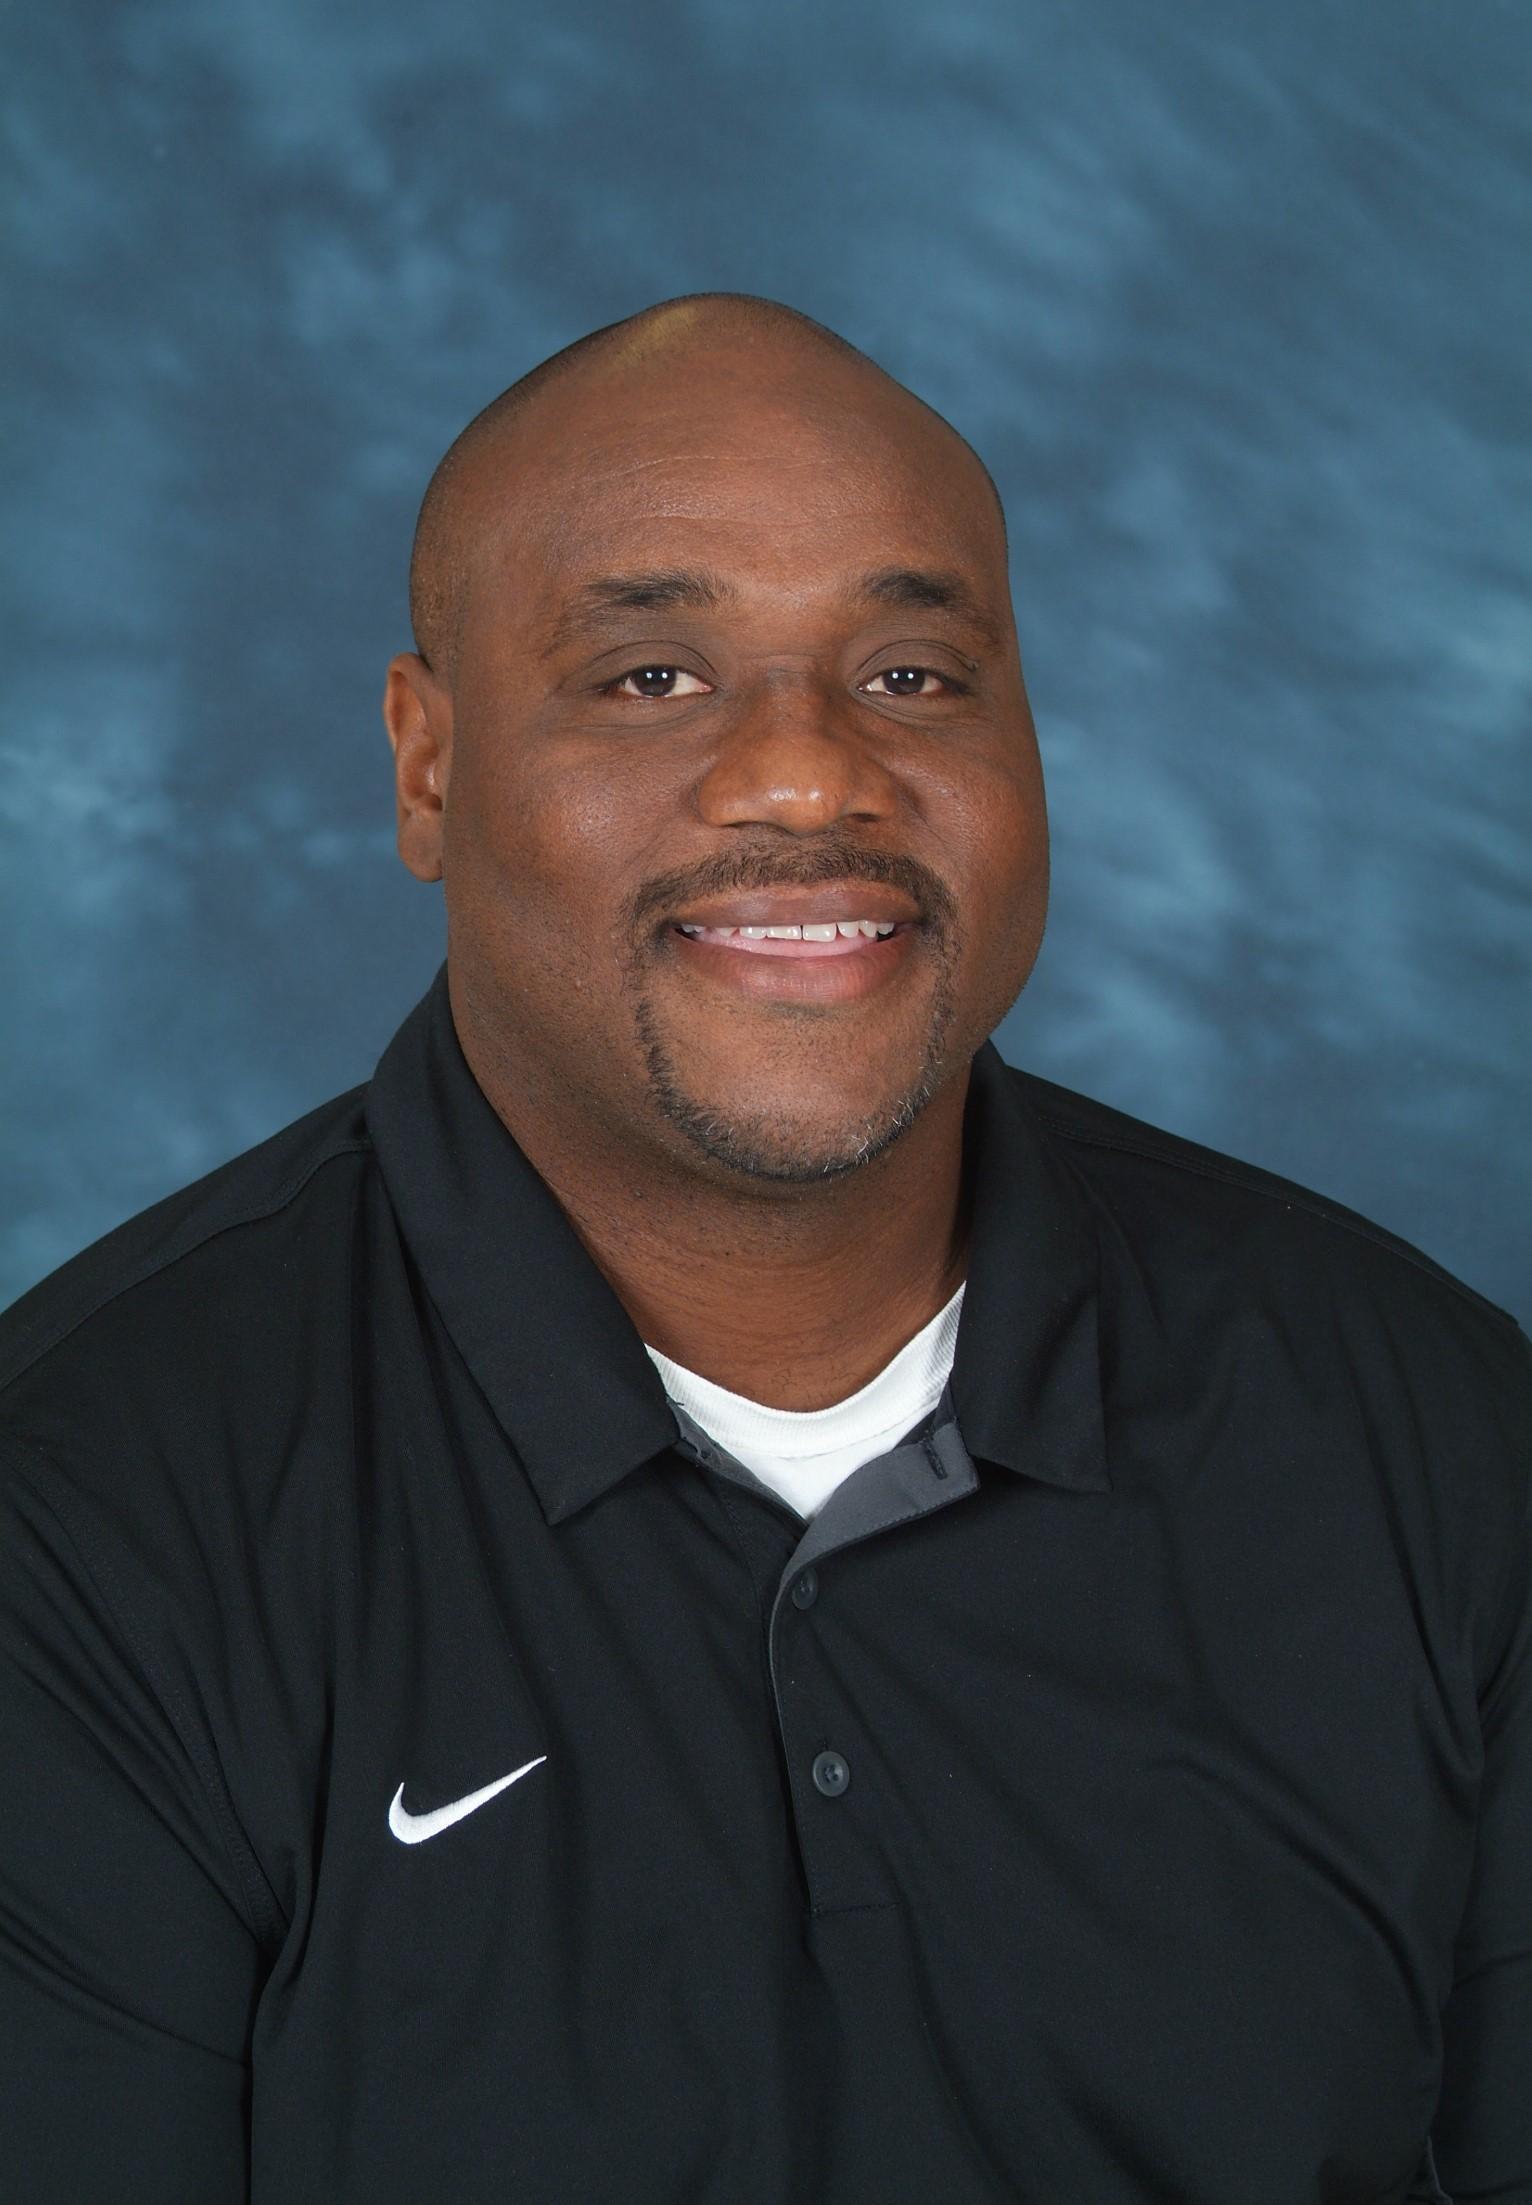 Coach Dobbs